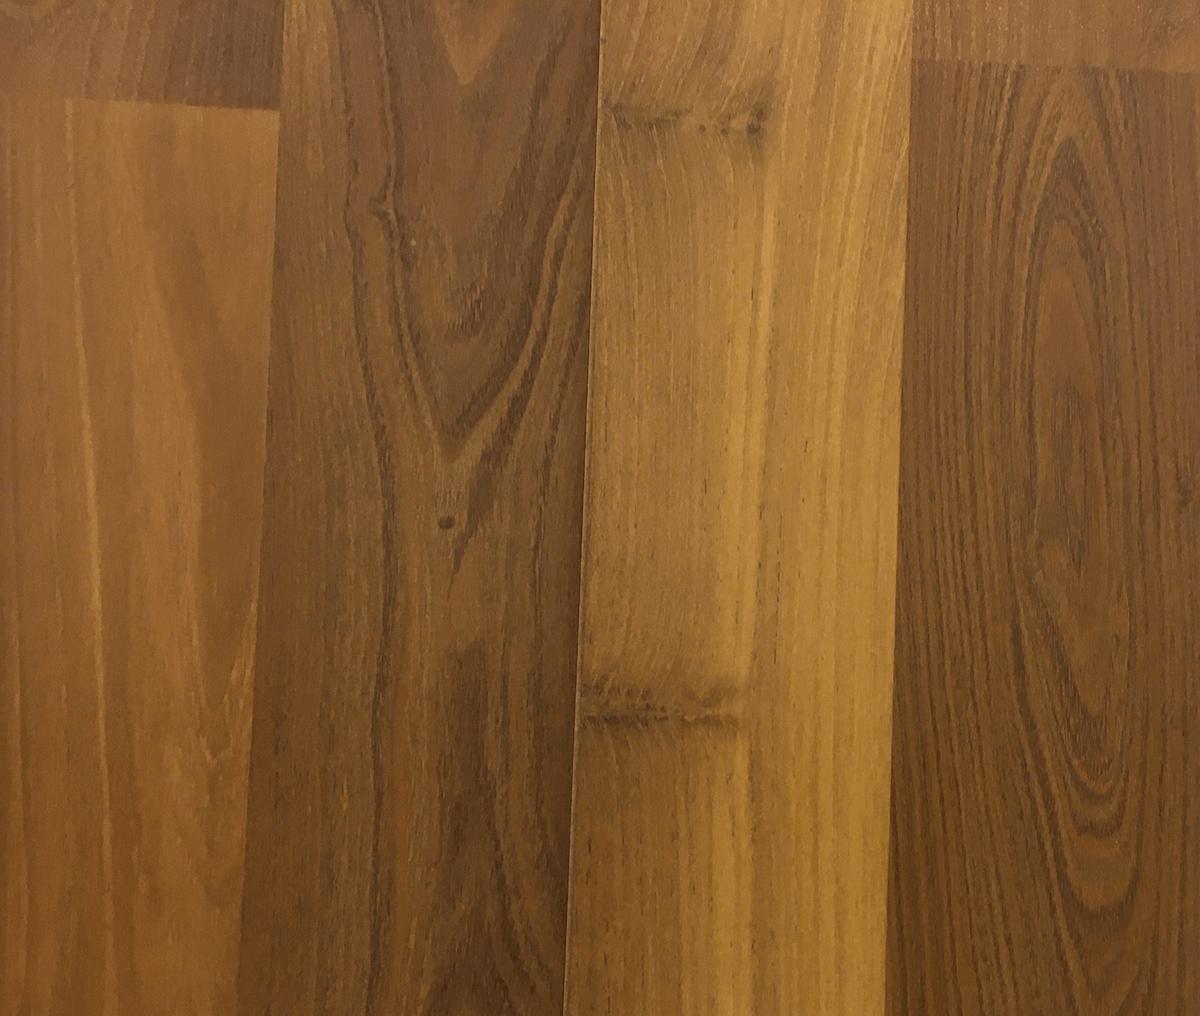 Variasi Tropical Laminate Flooring 8Mm  FinishesFloor CoveringIndoor Flooring 5